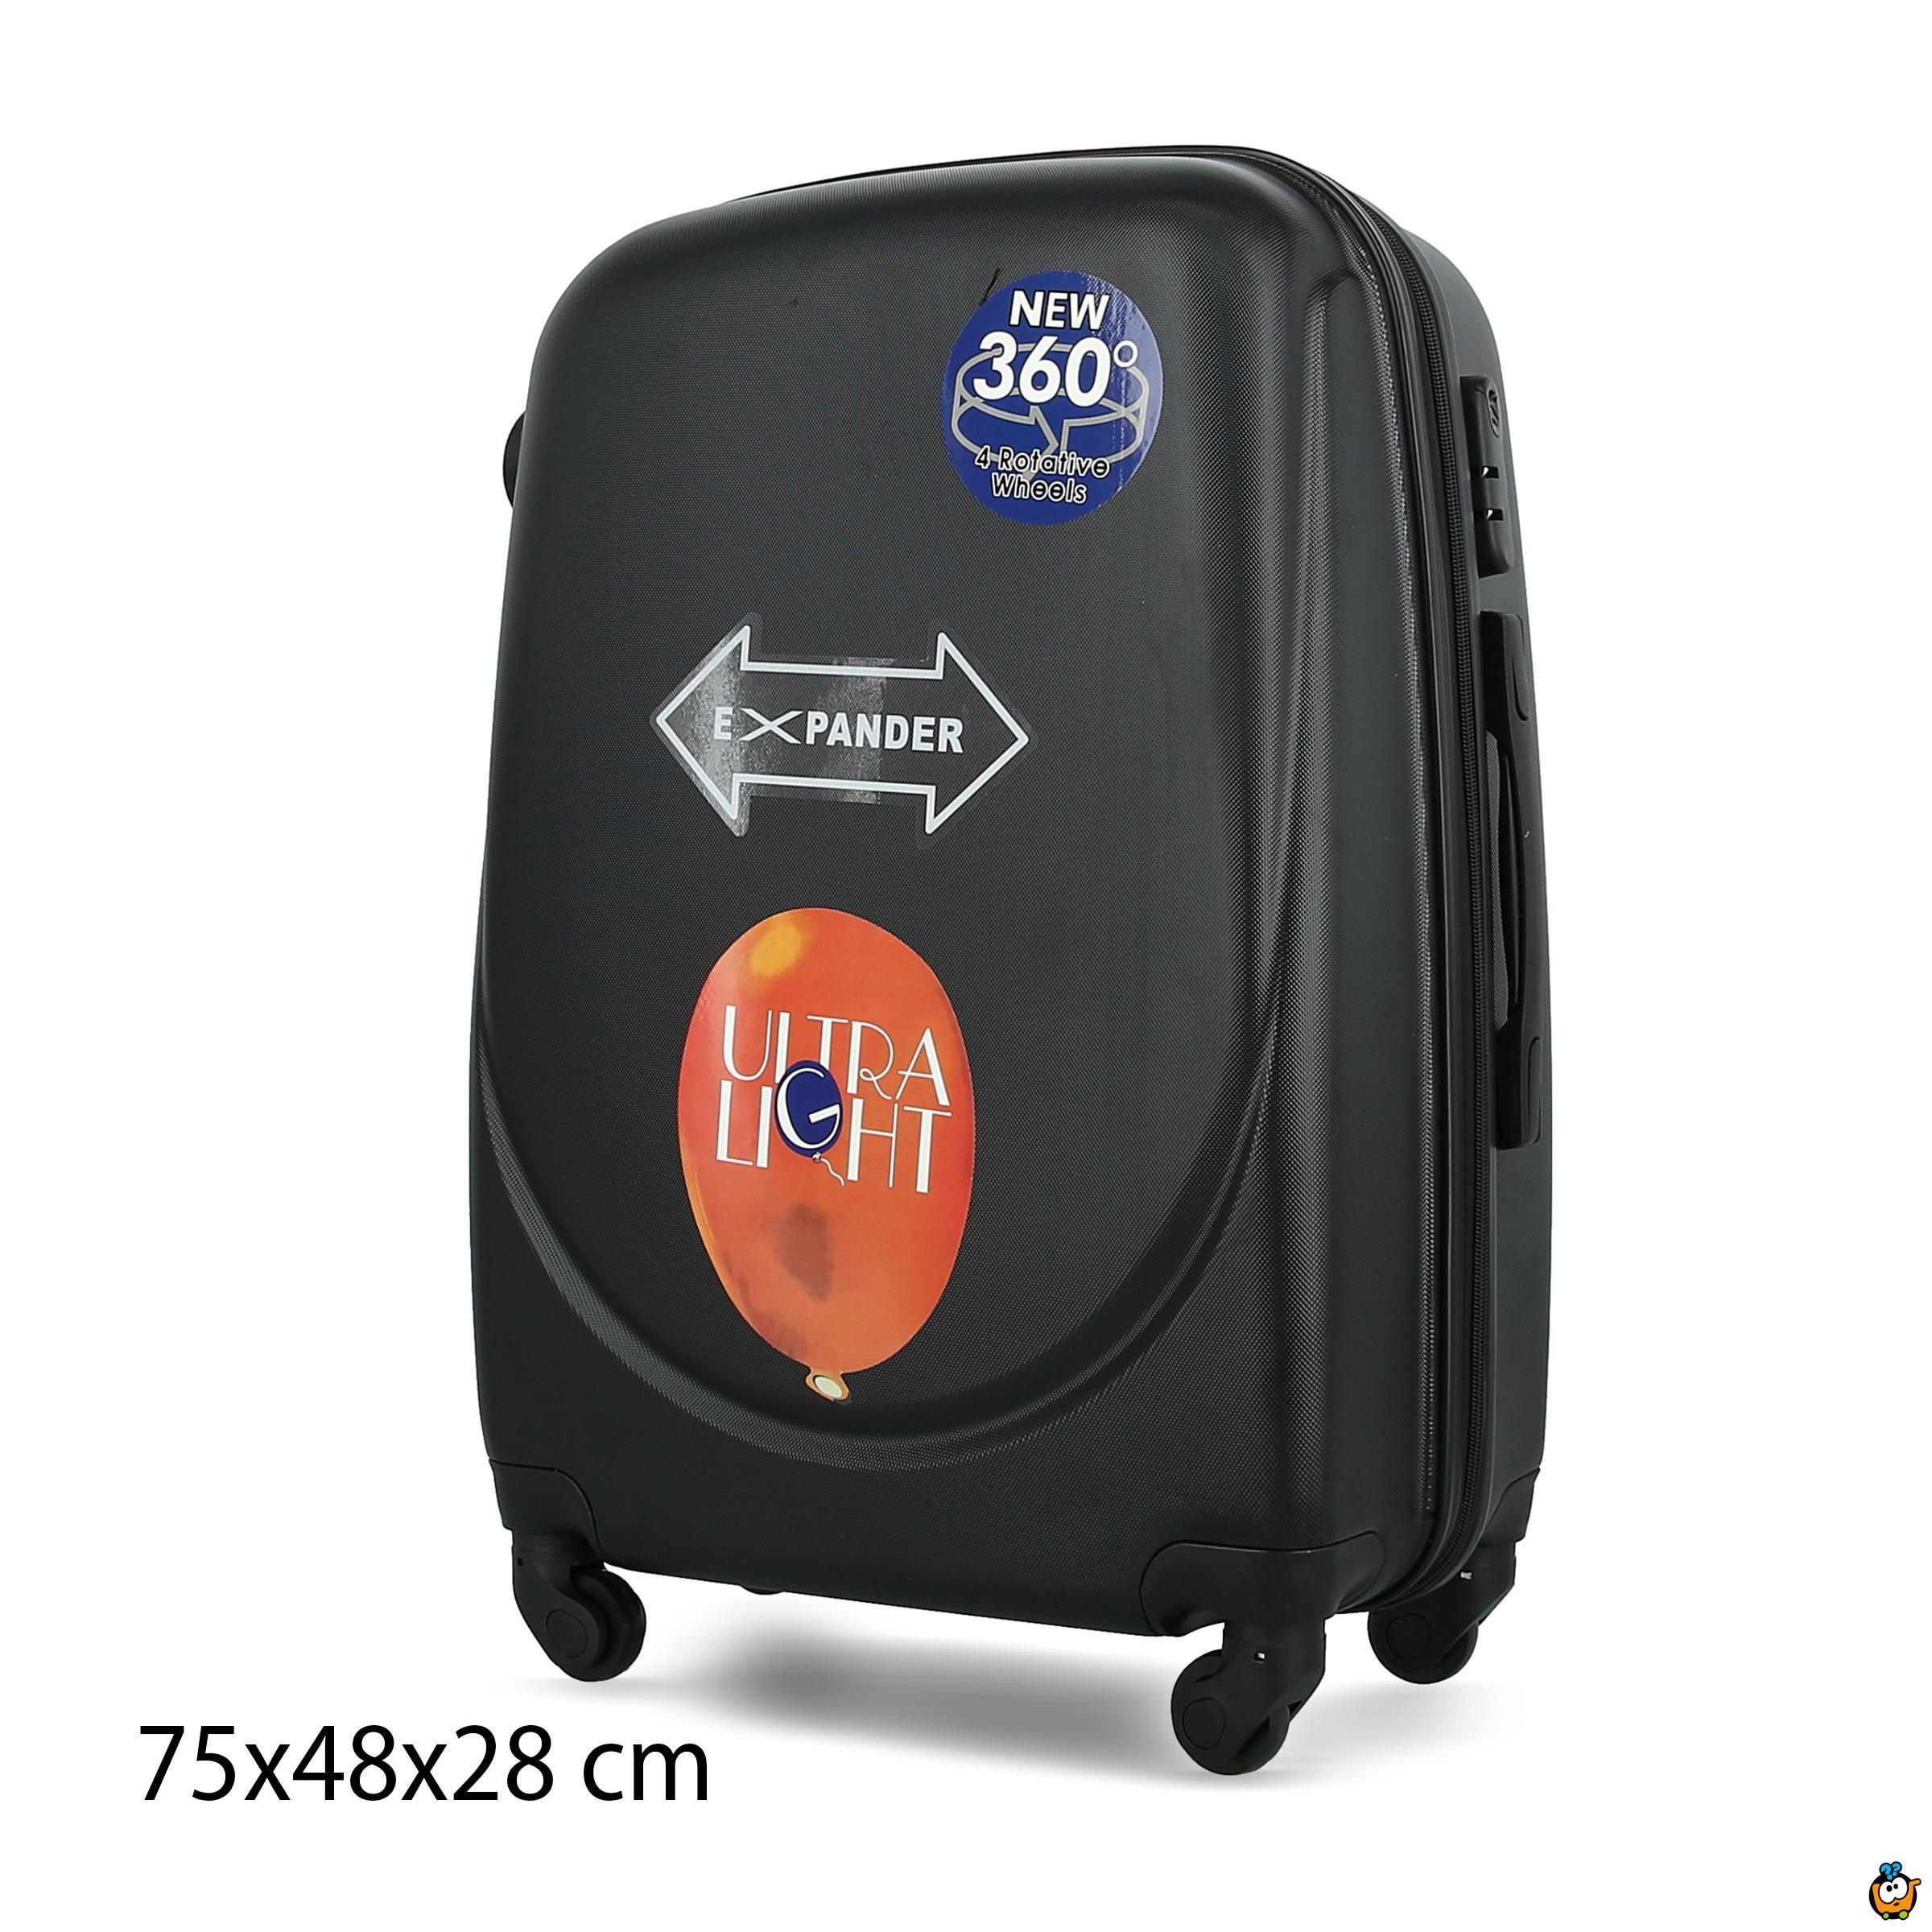 Putni kofer Expandable sa točkićima 360° -  CRNI XL